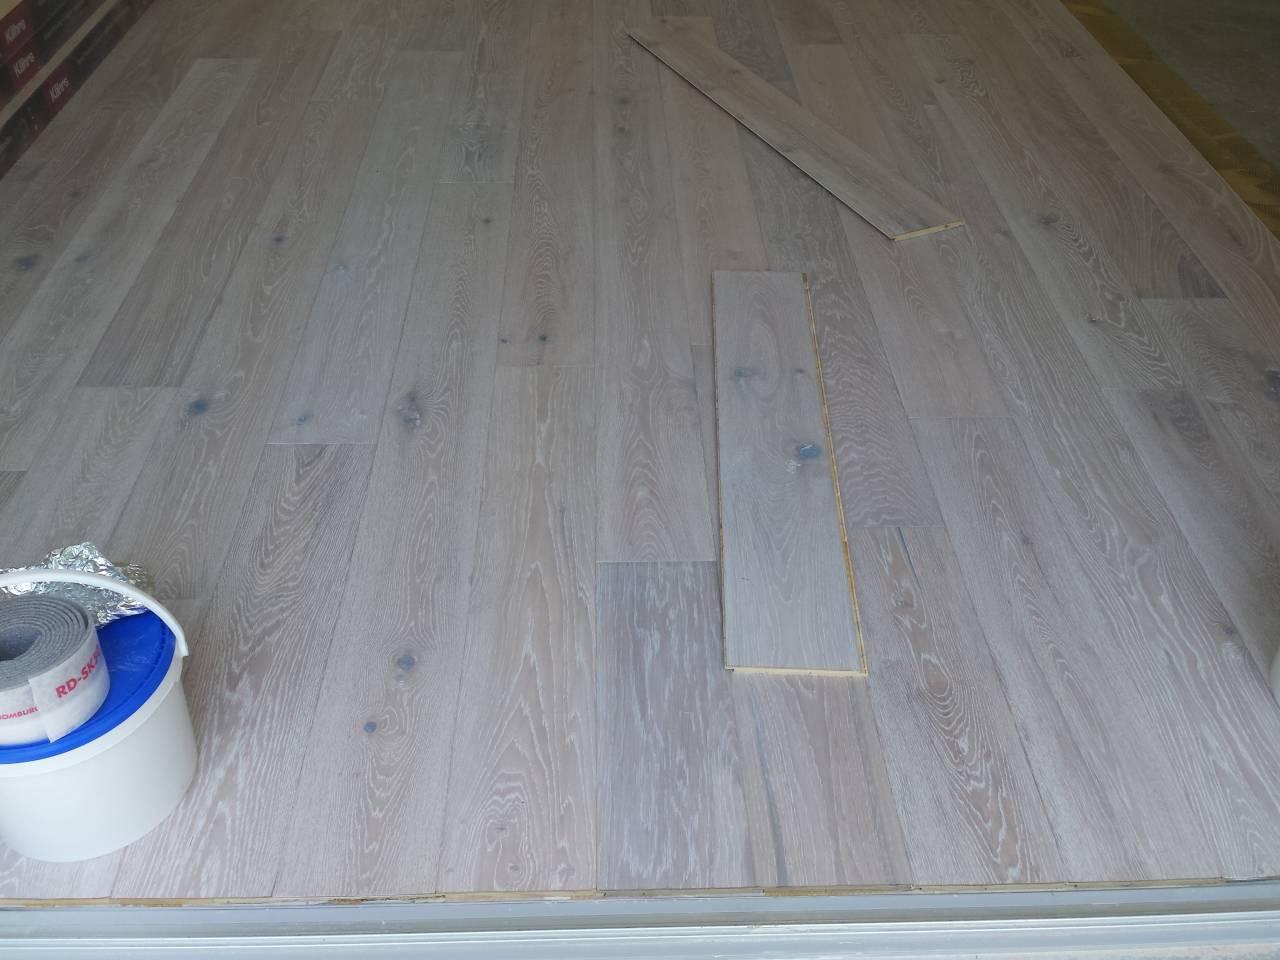 Fertigparkett verlegen, Fußbodenleger  Firma  Baron  für  alle  Fälle    Firma  Baron  für  alle  Fälle     Raumausstatter - Fußbodenleger -  Renovierungen -Dielenboden Parkettleger - Verlegung - Restaurierung und Sanierung, Aufbereitung / Aufarbeitung verschlissener Stellen.